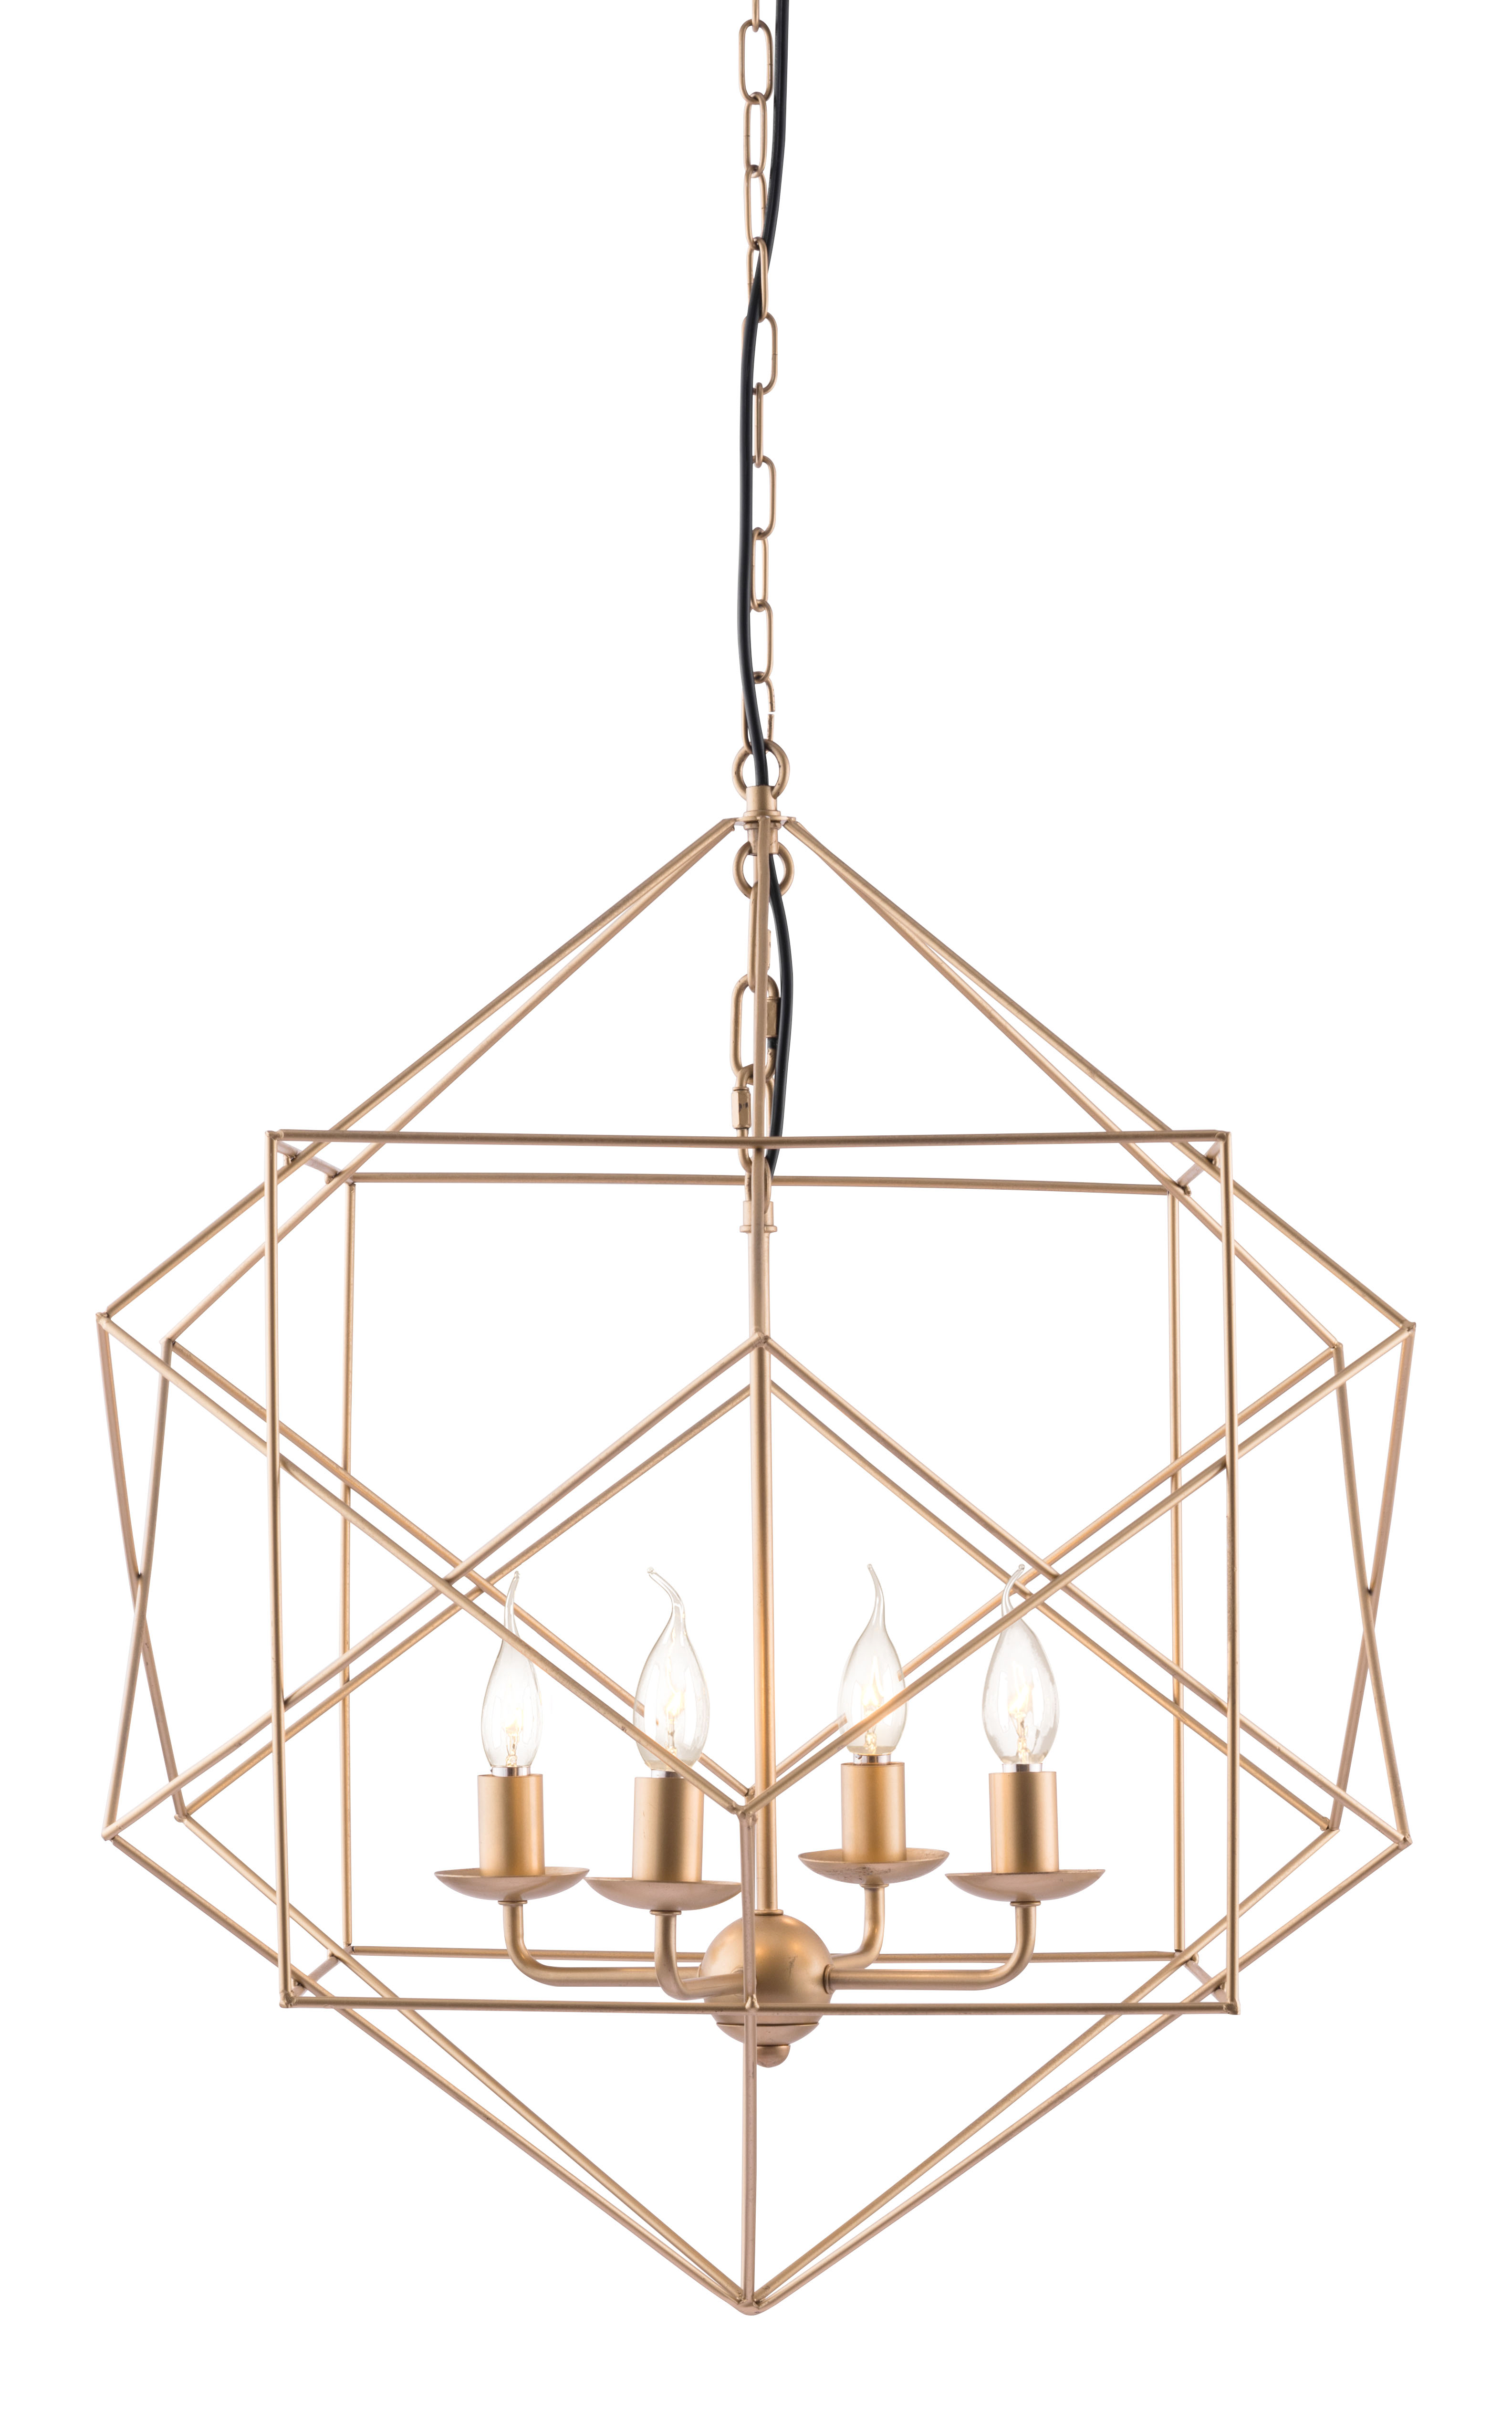 zuo-penta-ceiling-lamp-.jpg